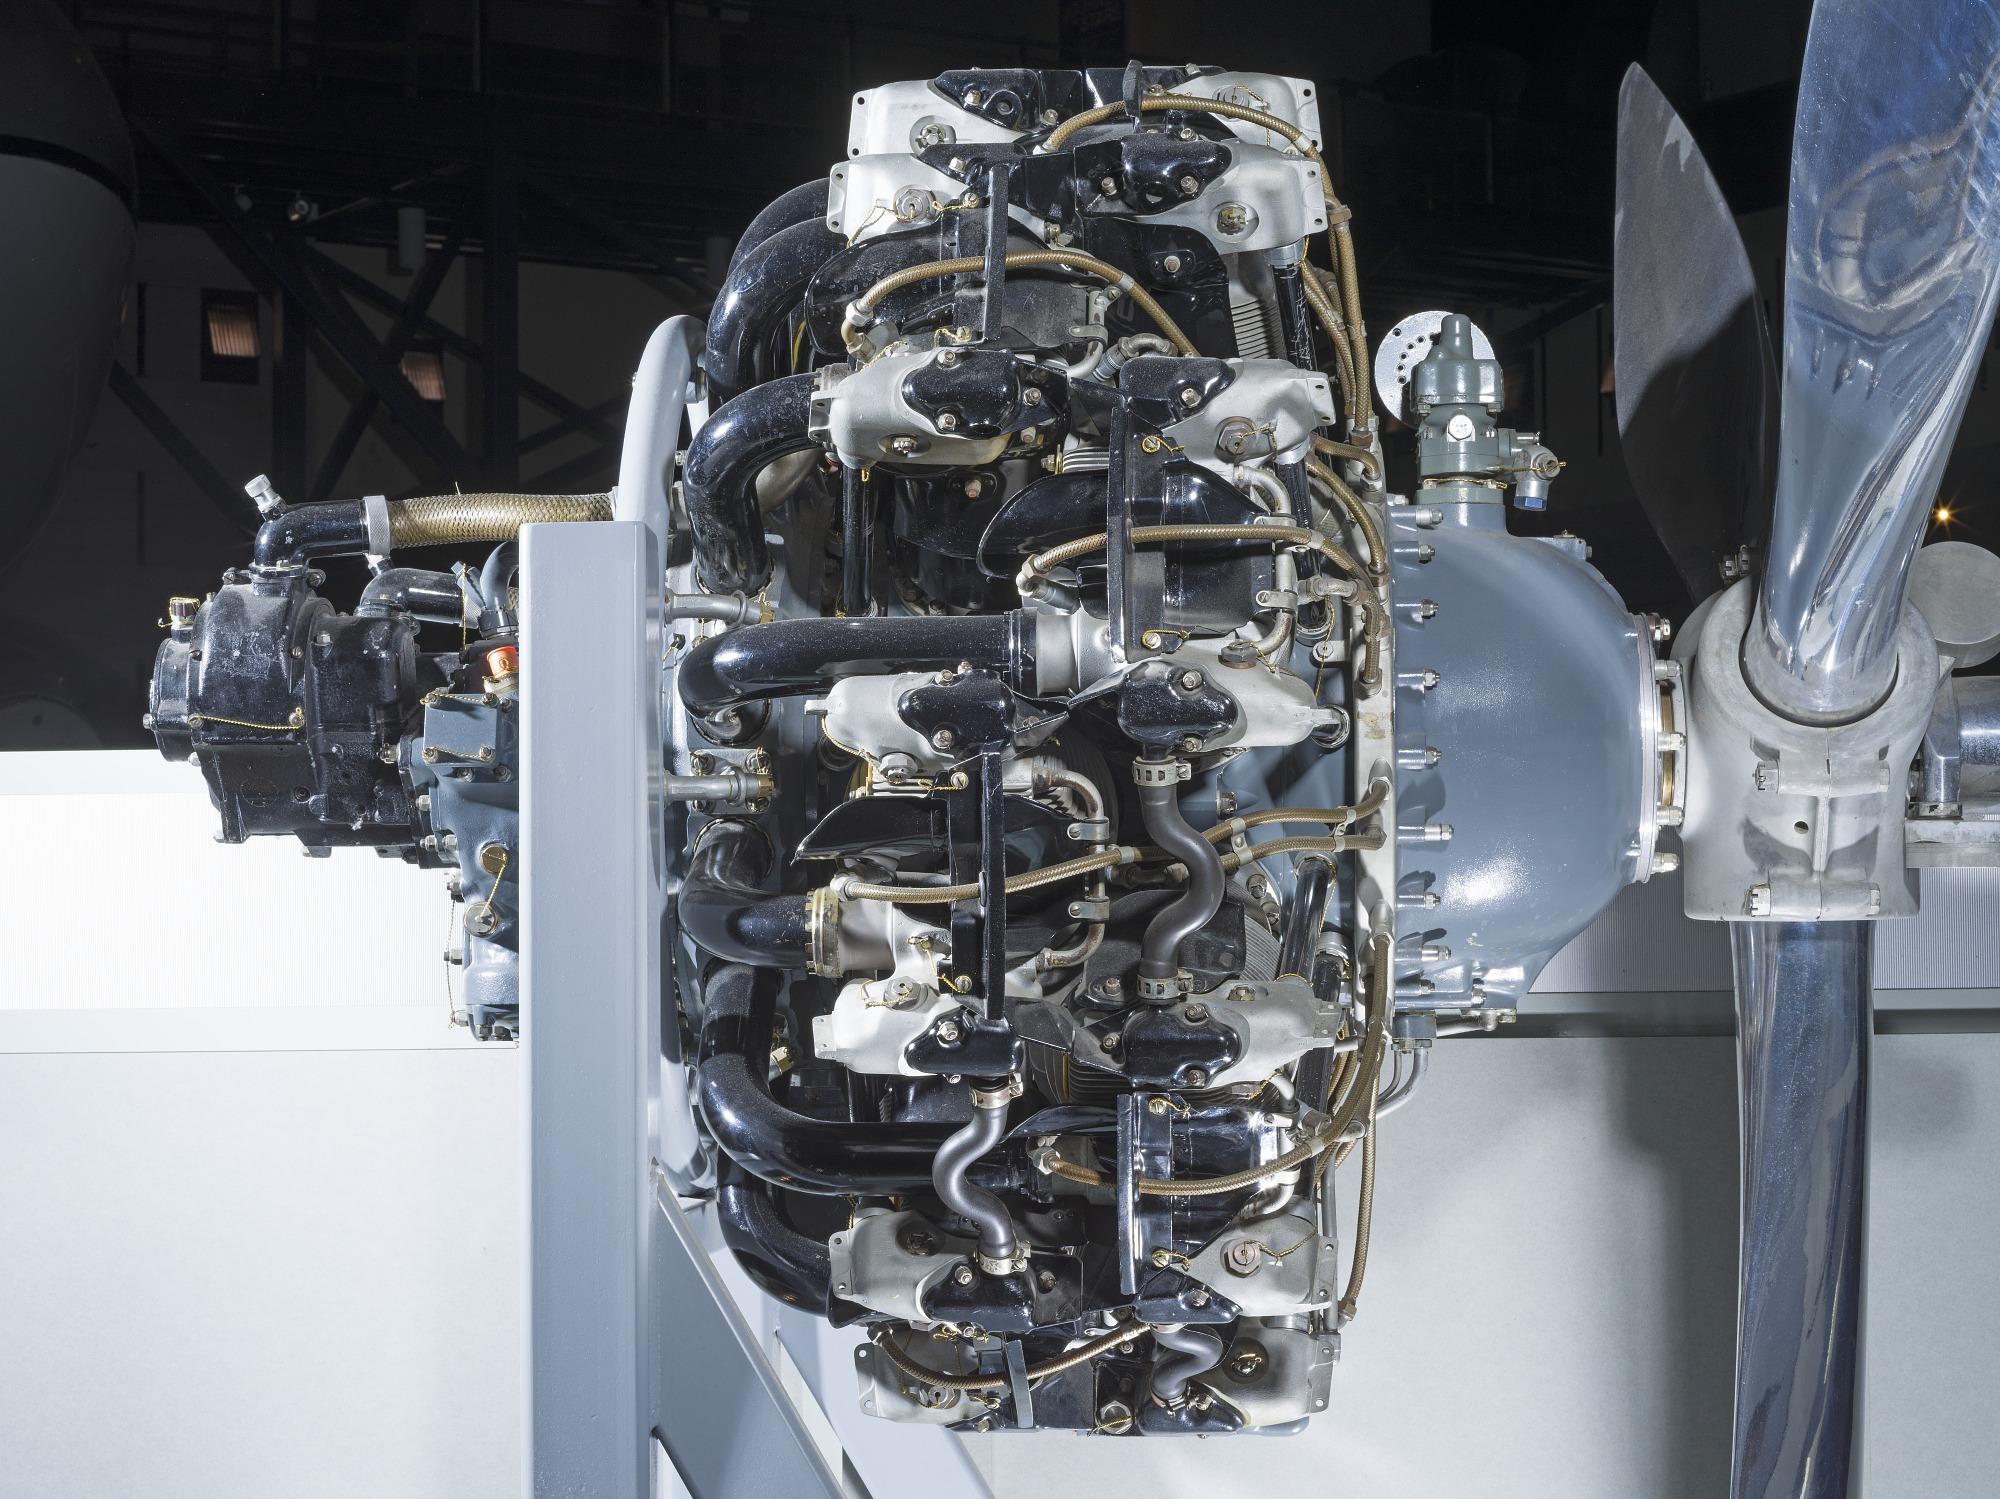 Pratt & Whitney Twin Wasp R-1830-92 Radial Engine | National